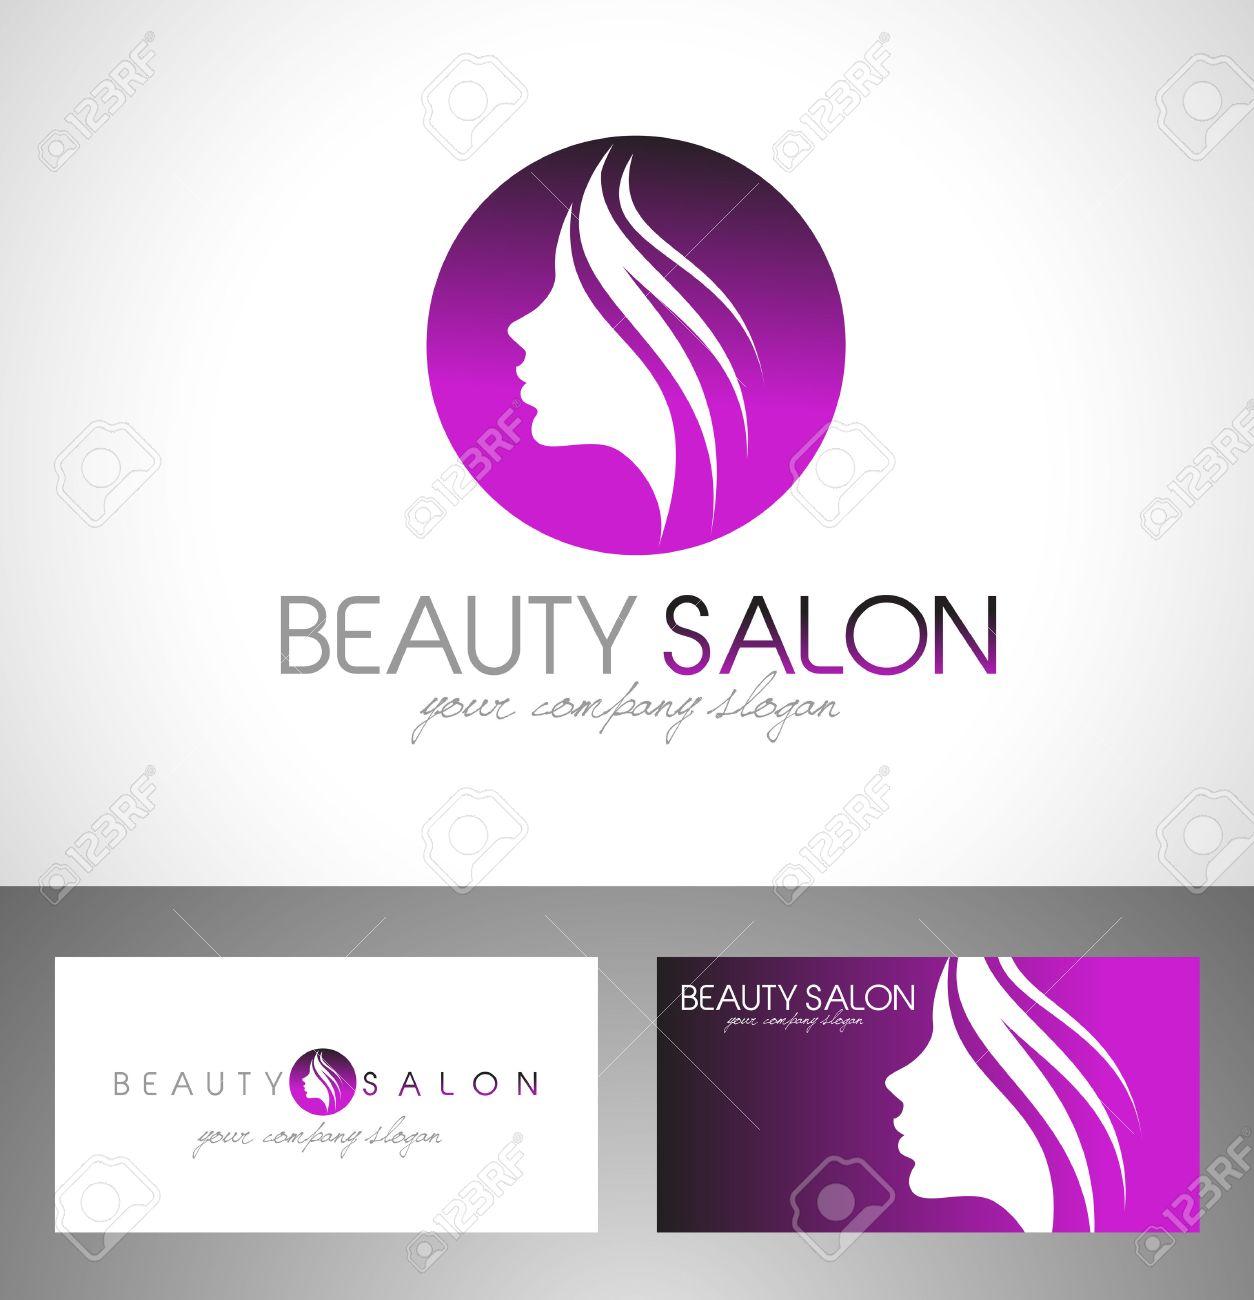 Beauty Female Face Logo Design Cosmetic Salon Logo Design Creative Royalty Free Cliparts Vectors And Stock Illustration Image 45363230